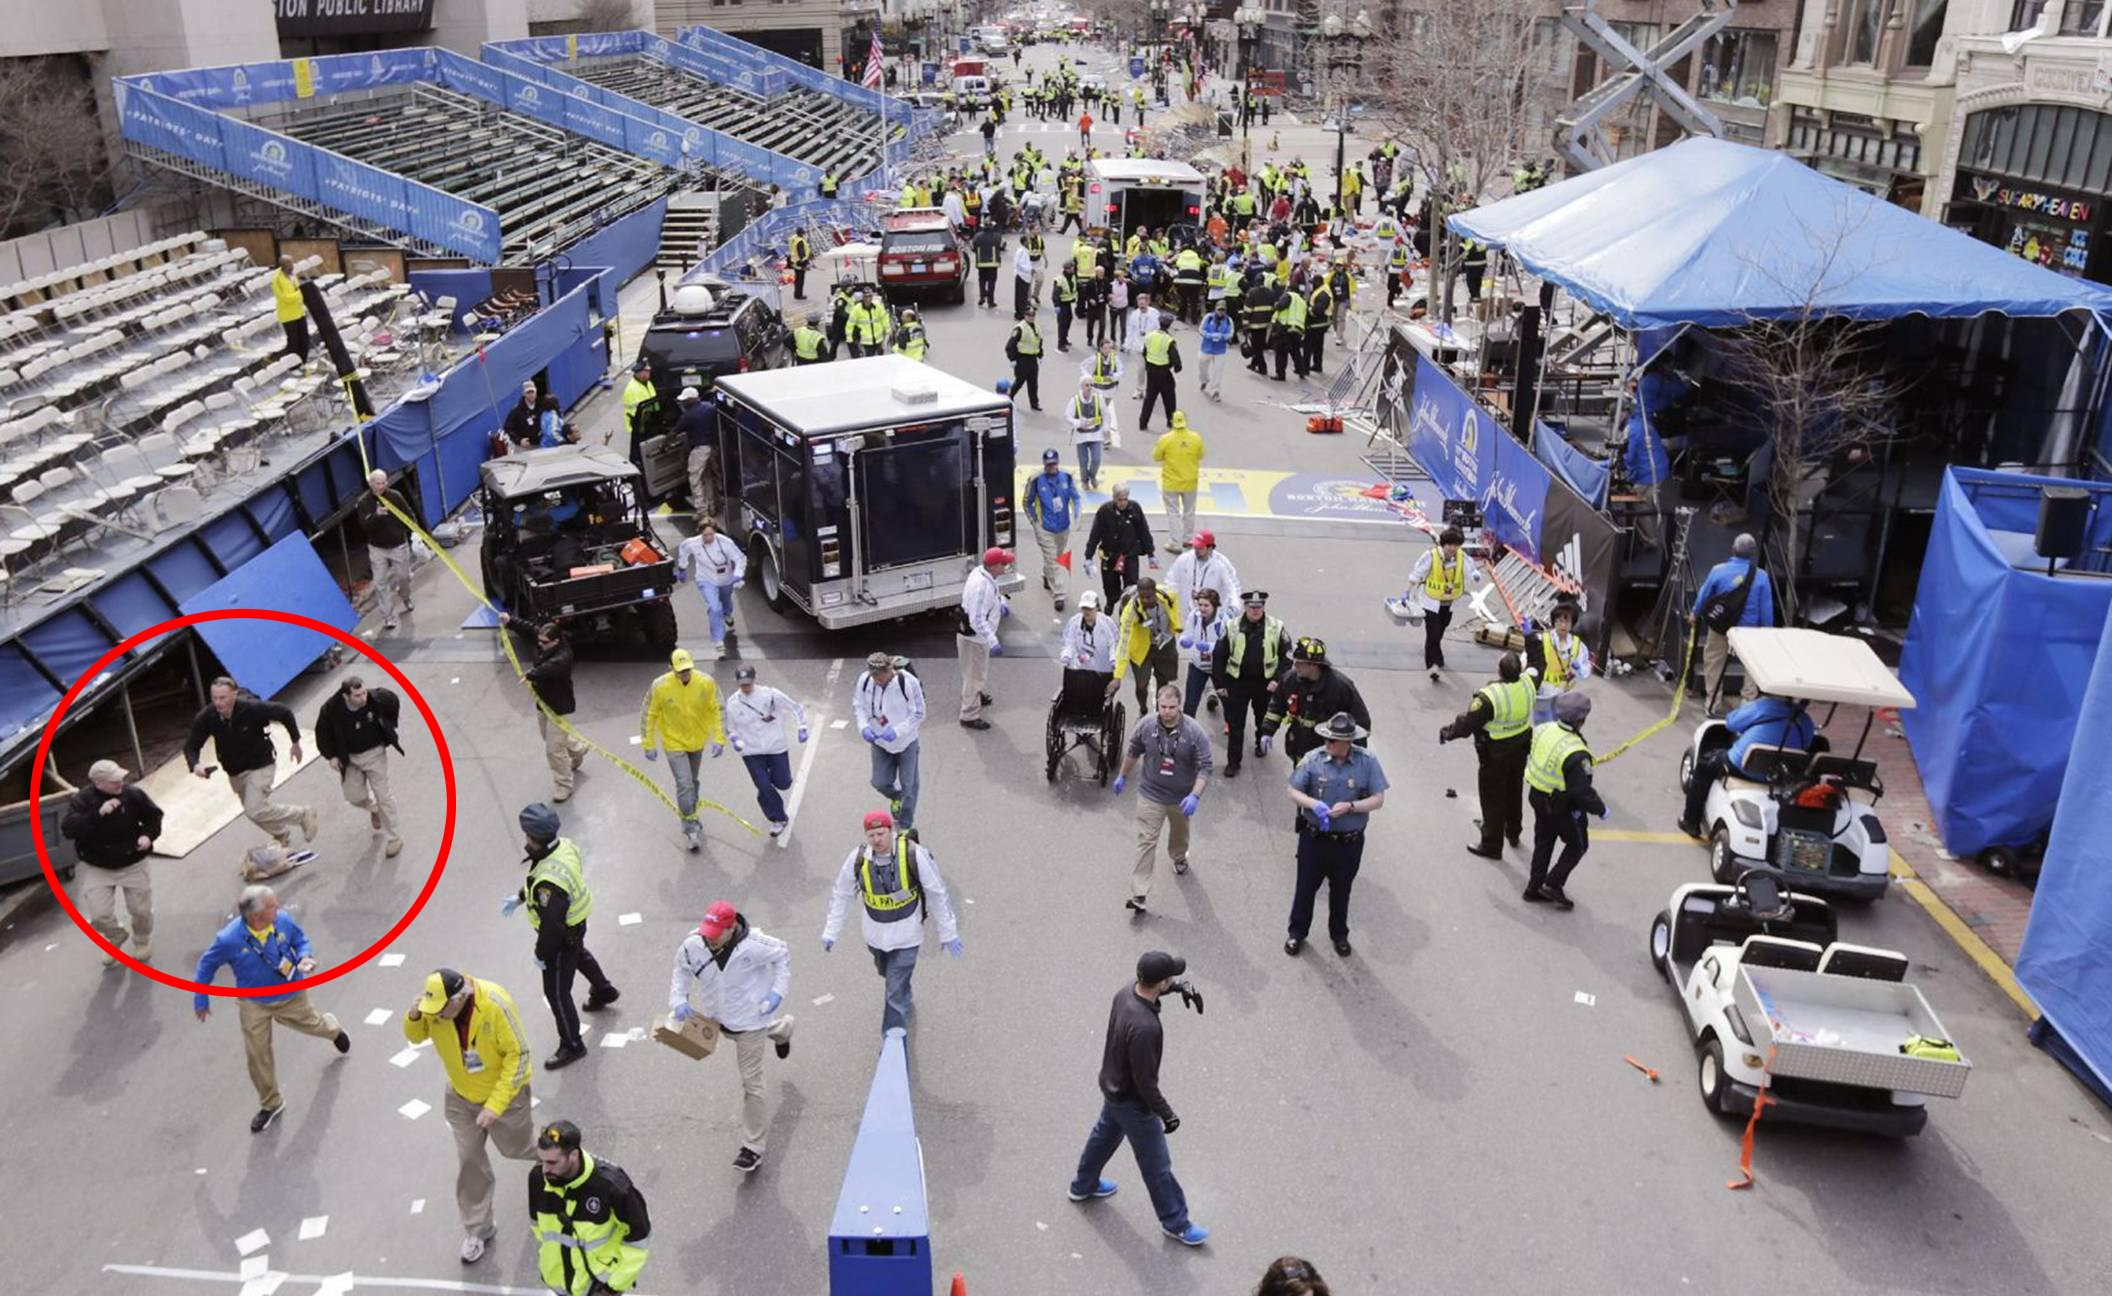 https://i0.wp.com/whatreallyhappened.com/IMAGES/BostonBomb/blackandtan.jpg